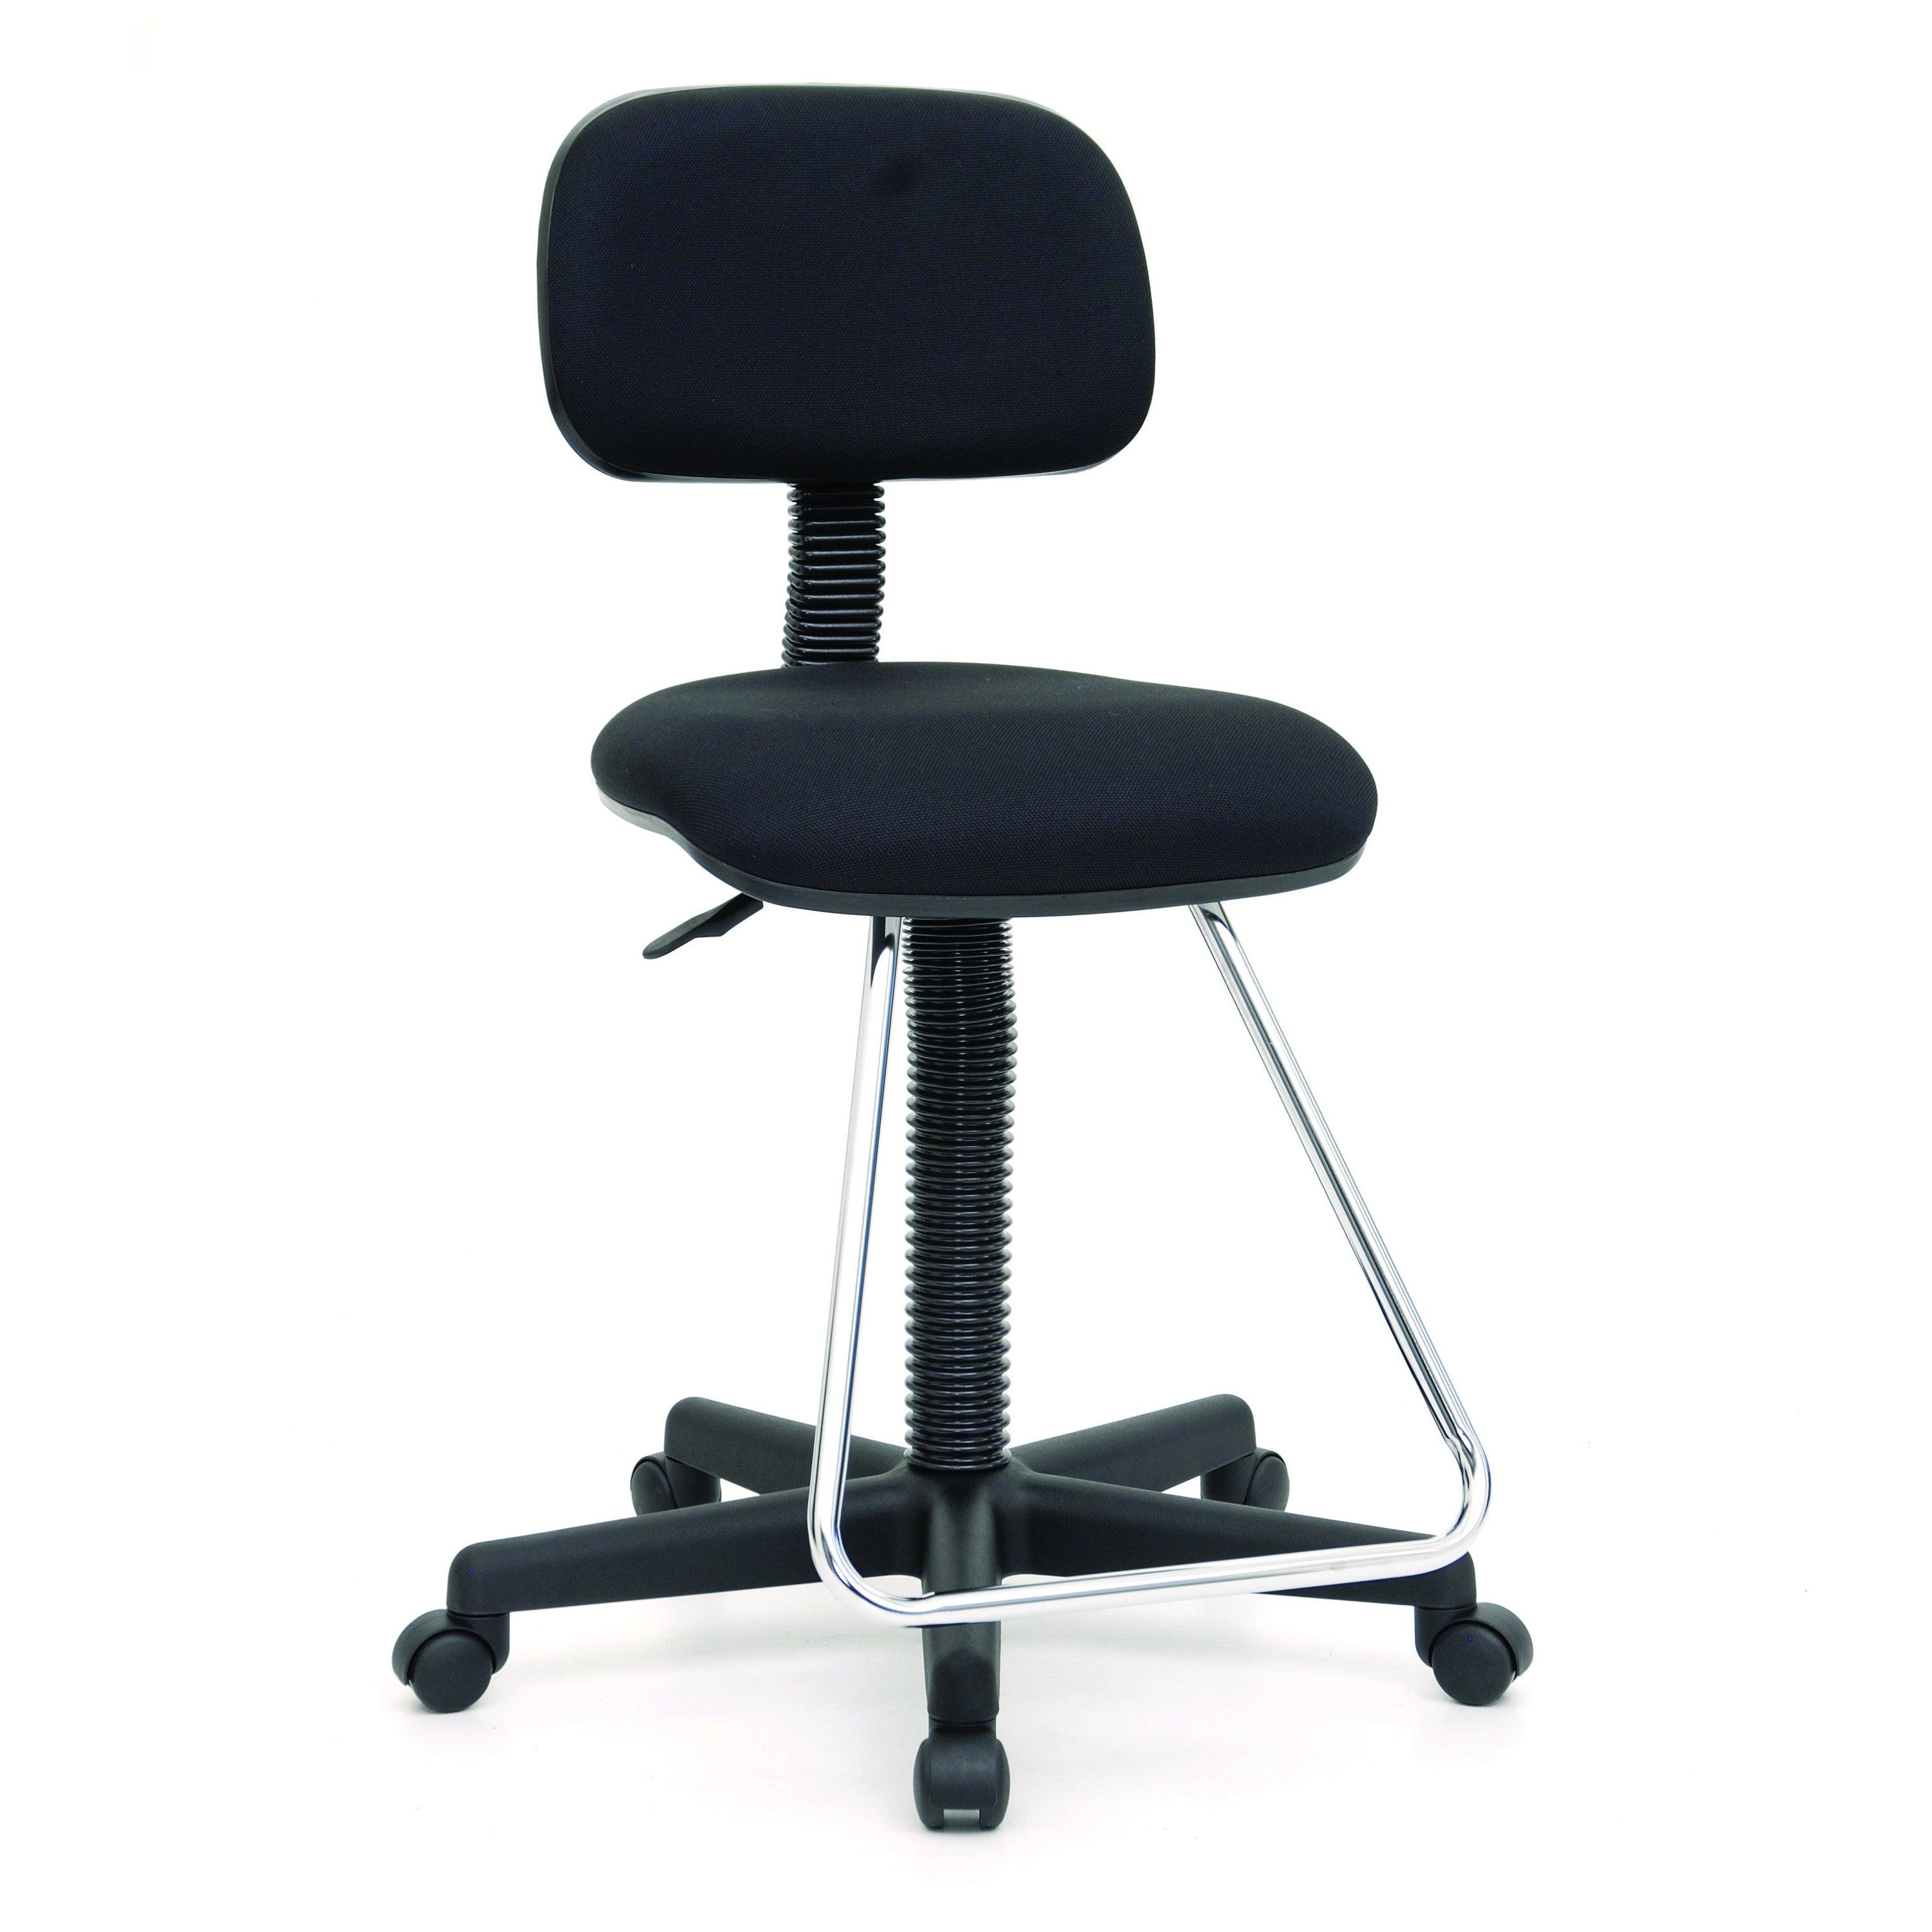 Overstock.com Studio Designs Black Maxima II Drafting Chair at Sears.com